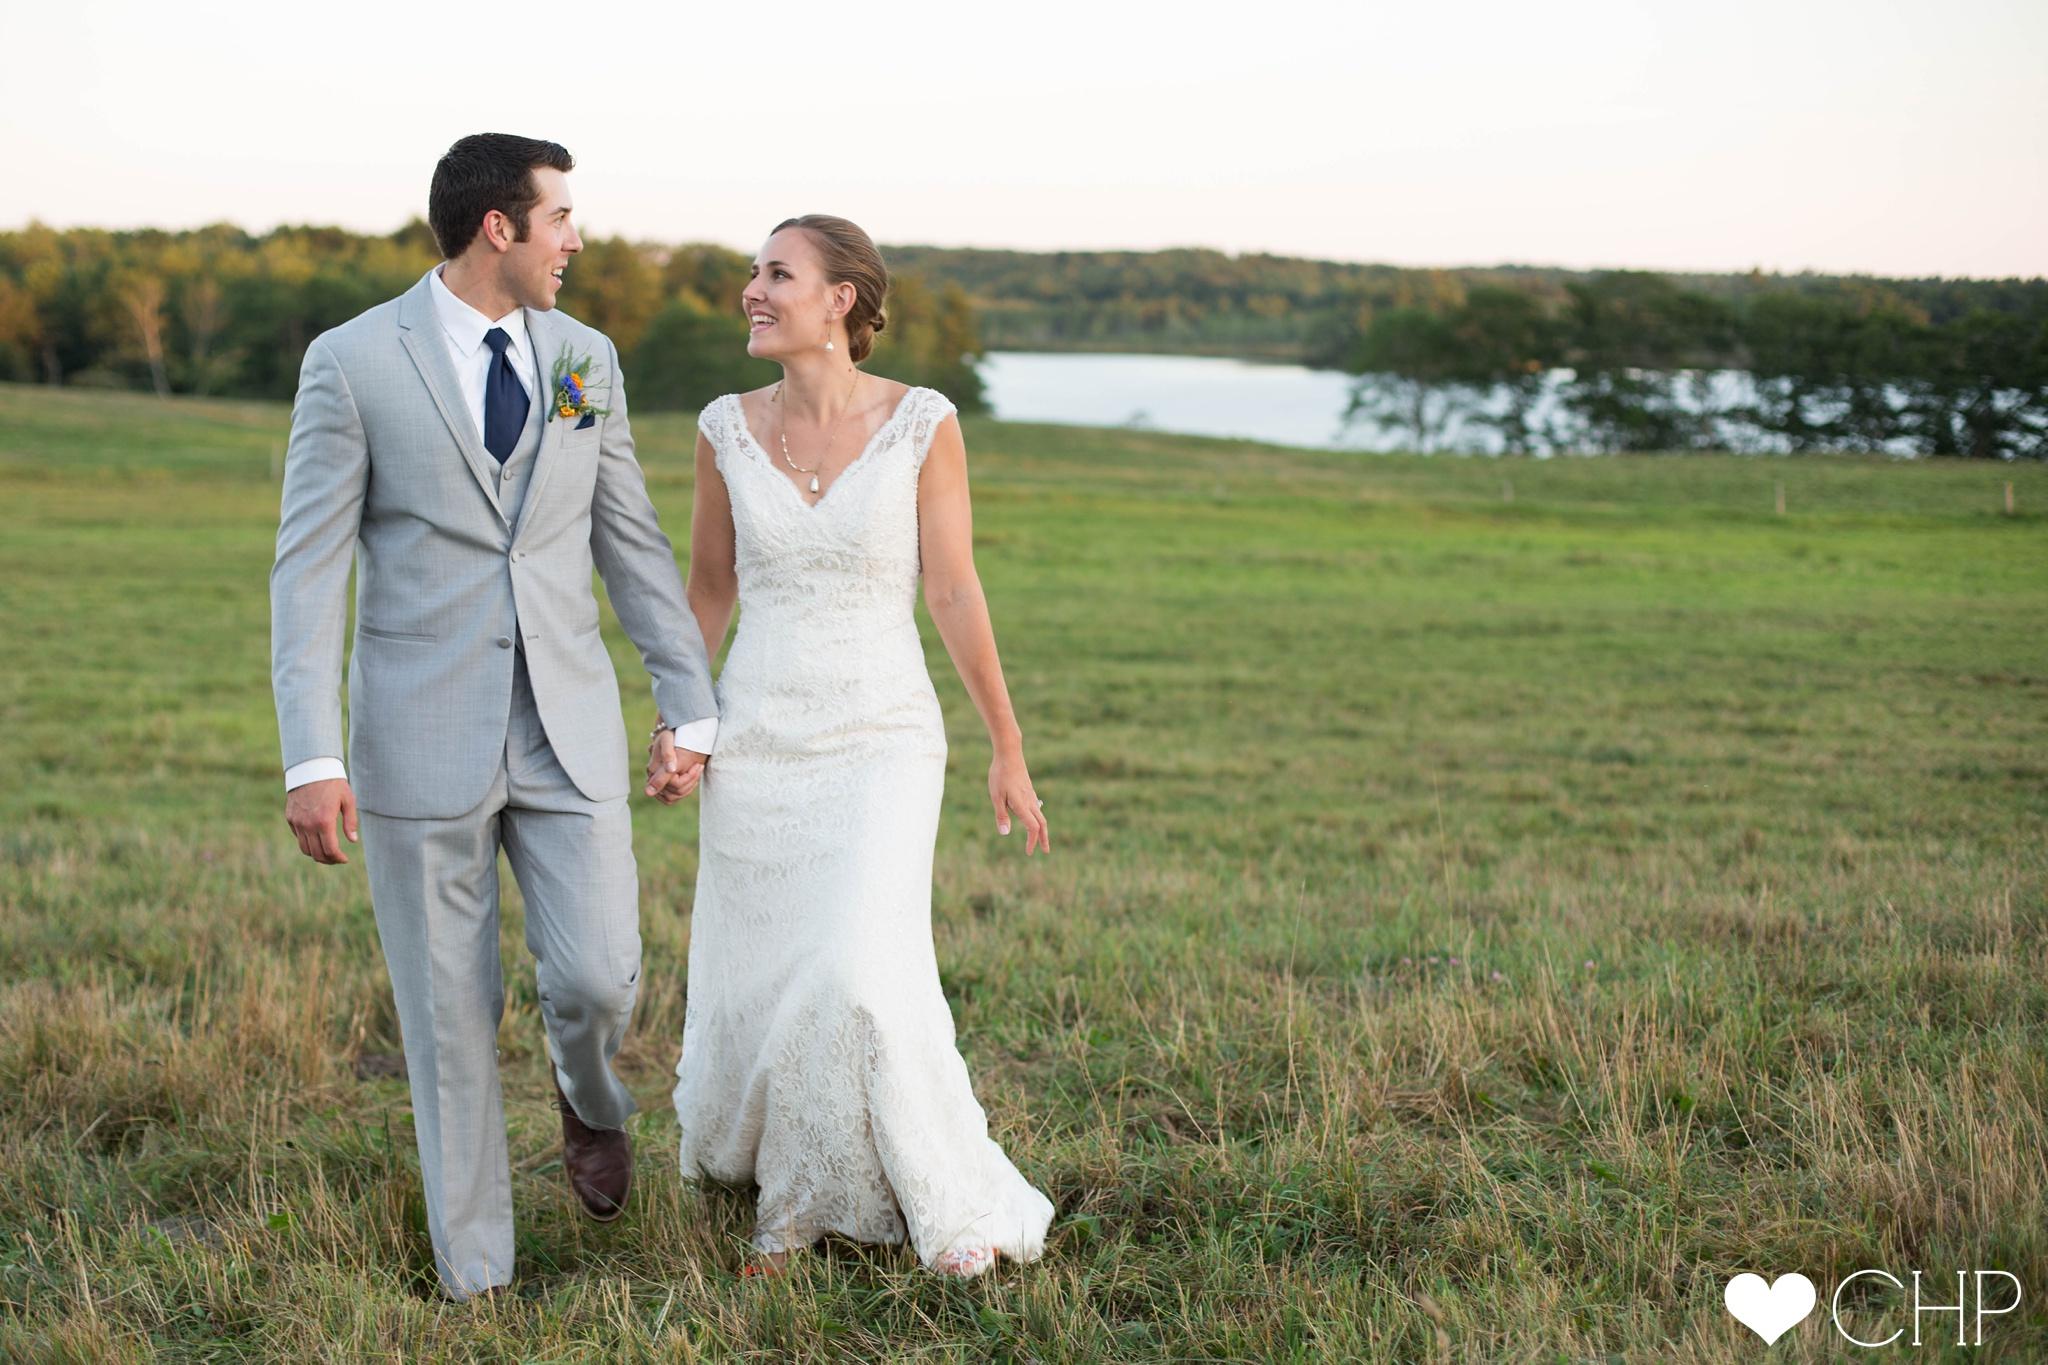 Wedding Photographers in Wladoboro Maine